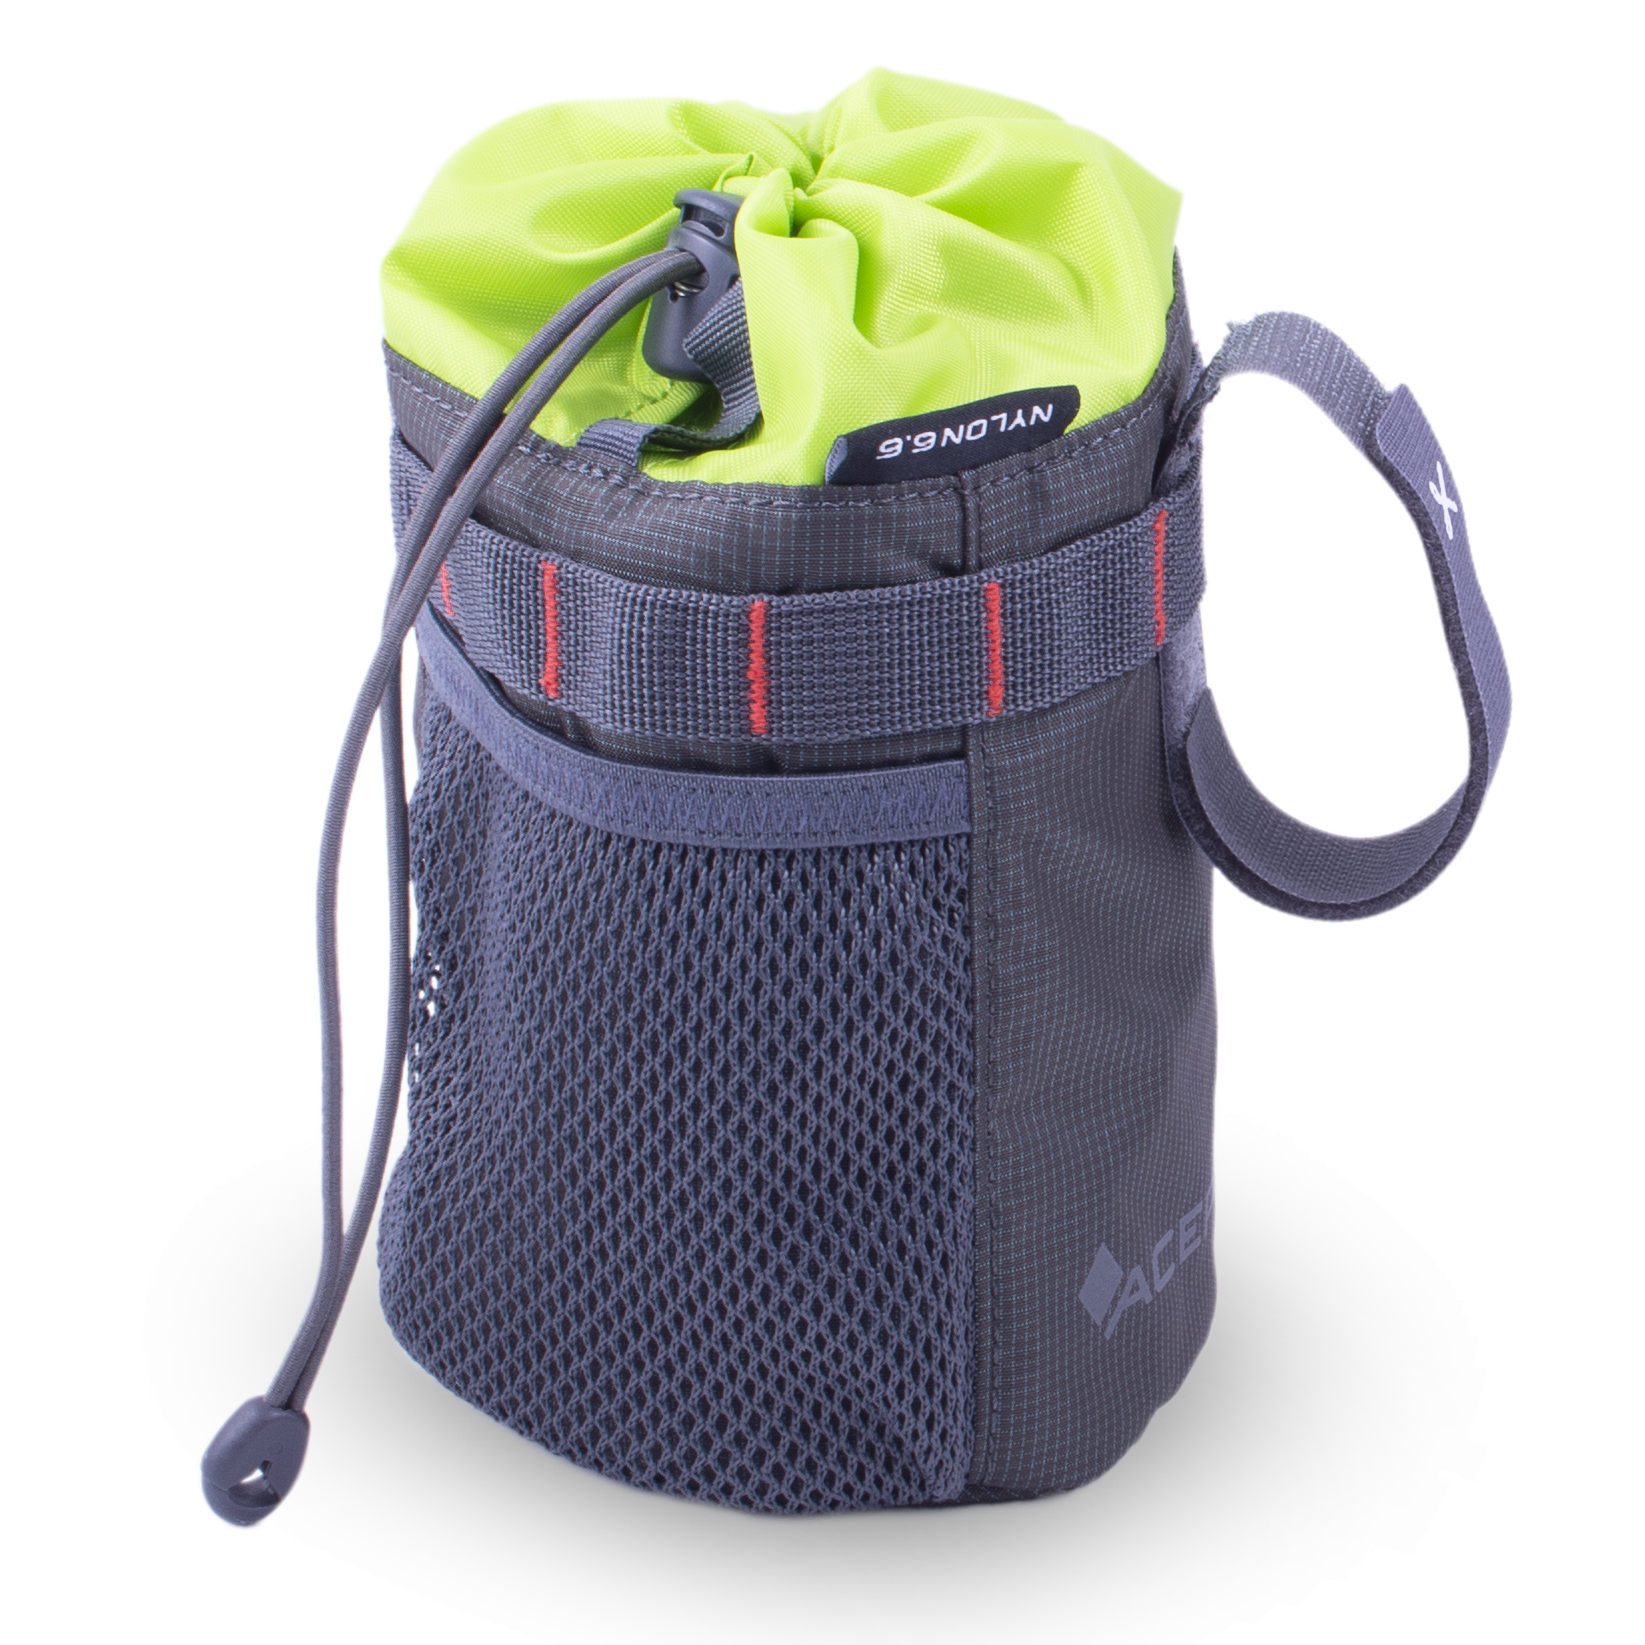 Acepac Fat Bottle Bag - grey